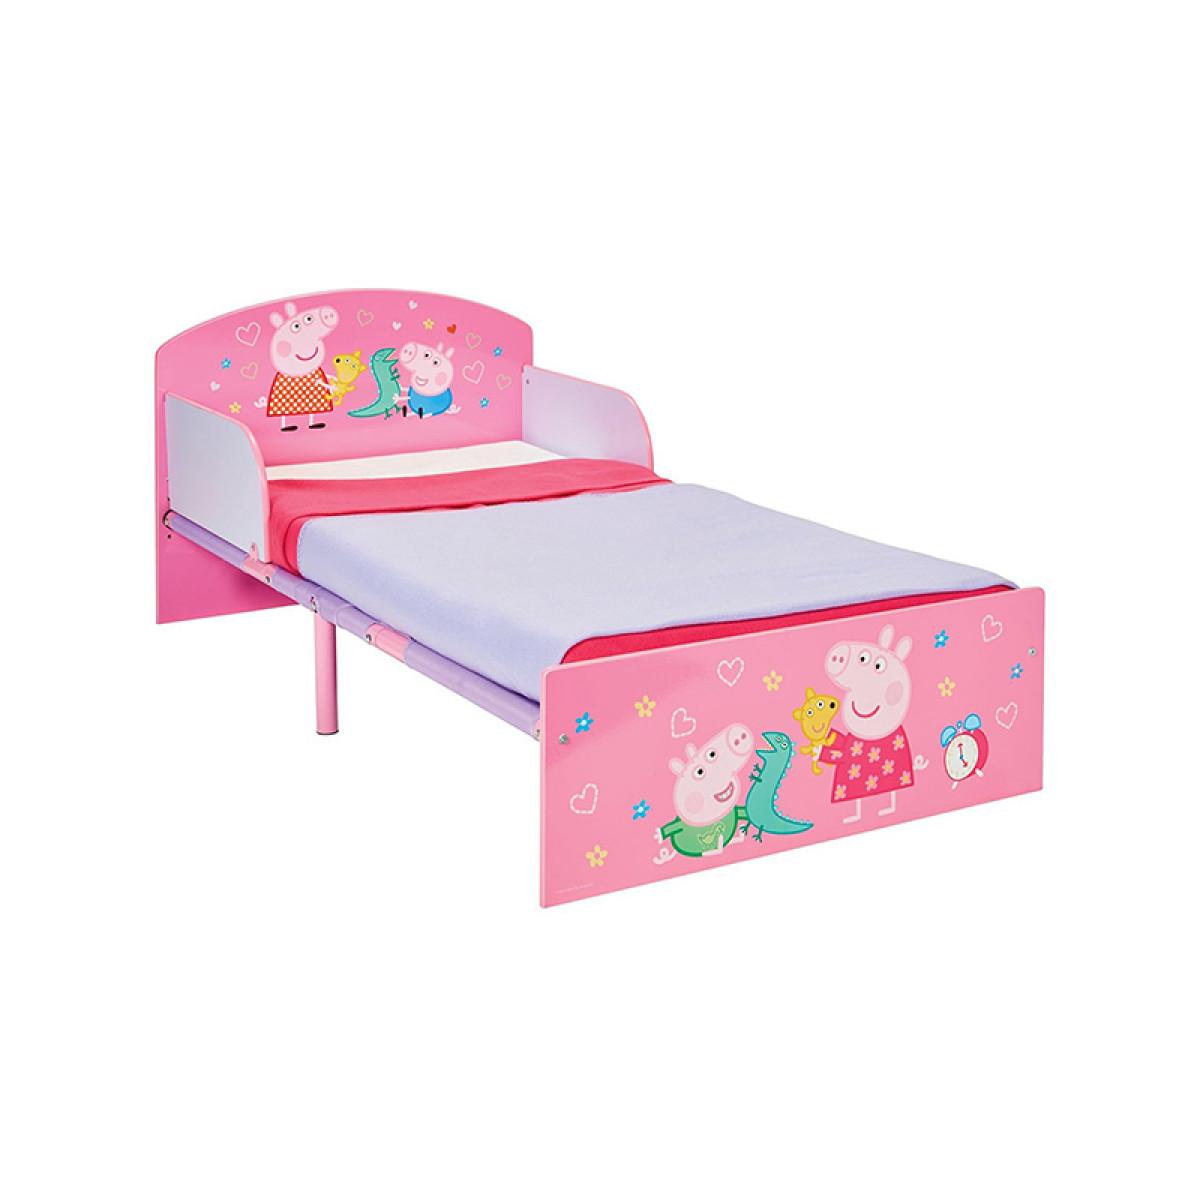 Peppa Pig Toddler Bed Bedroom